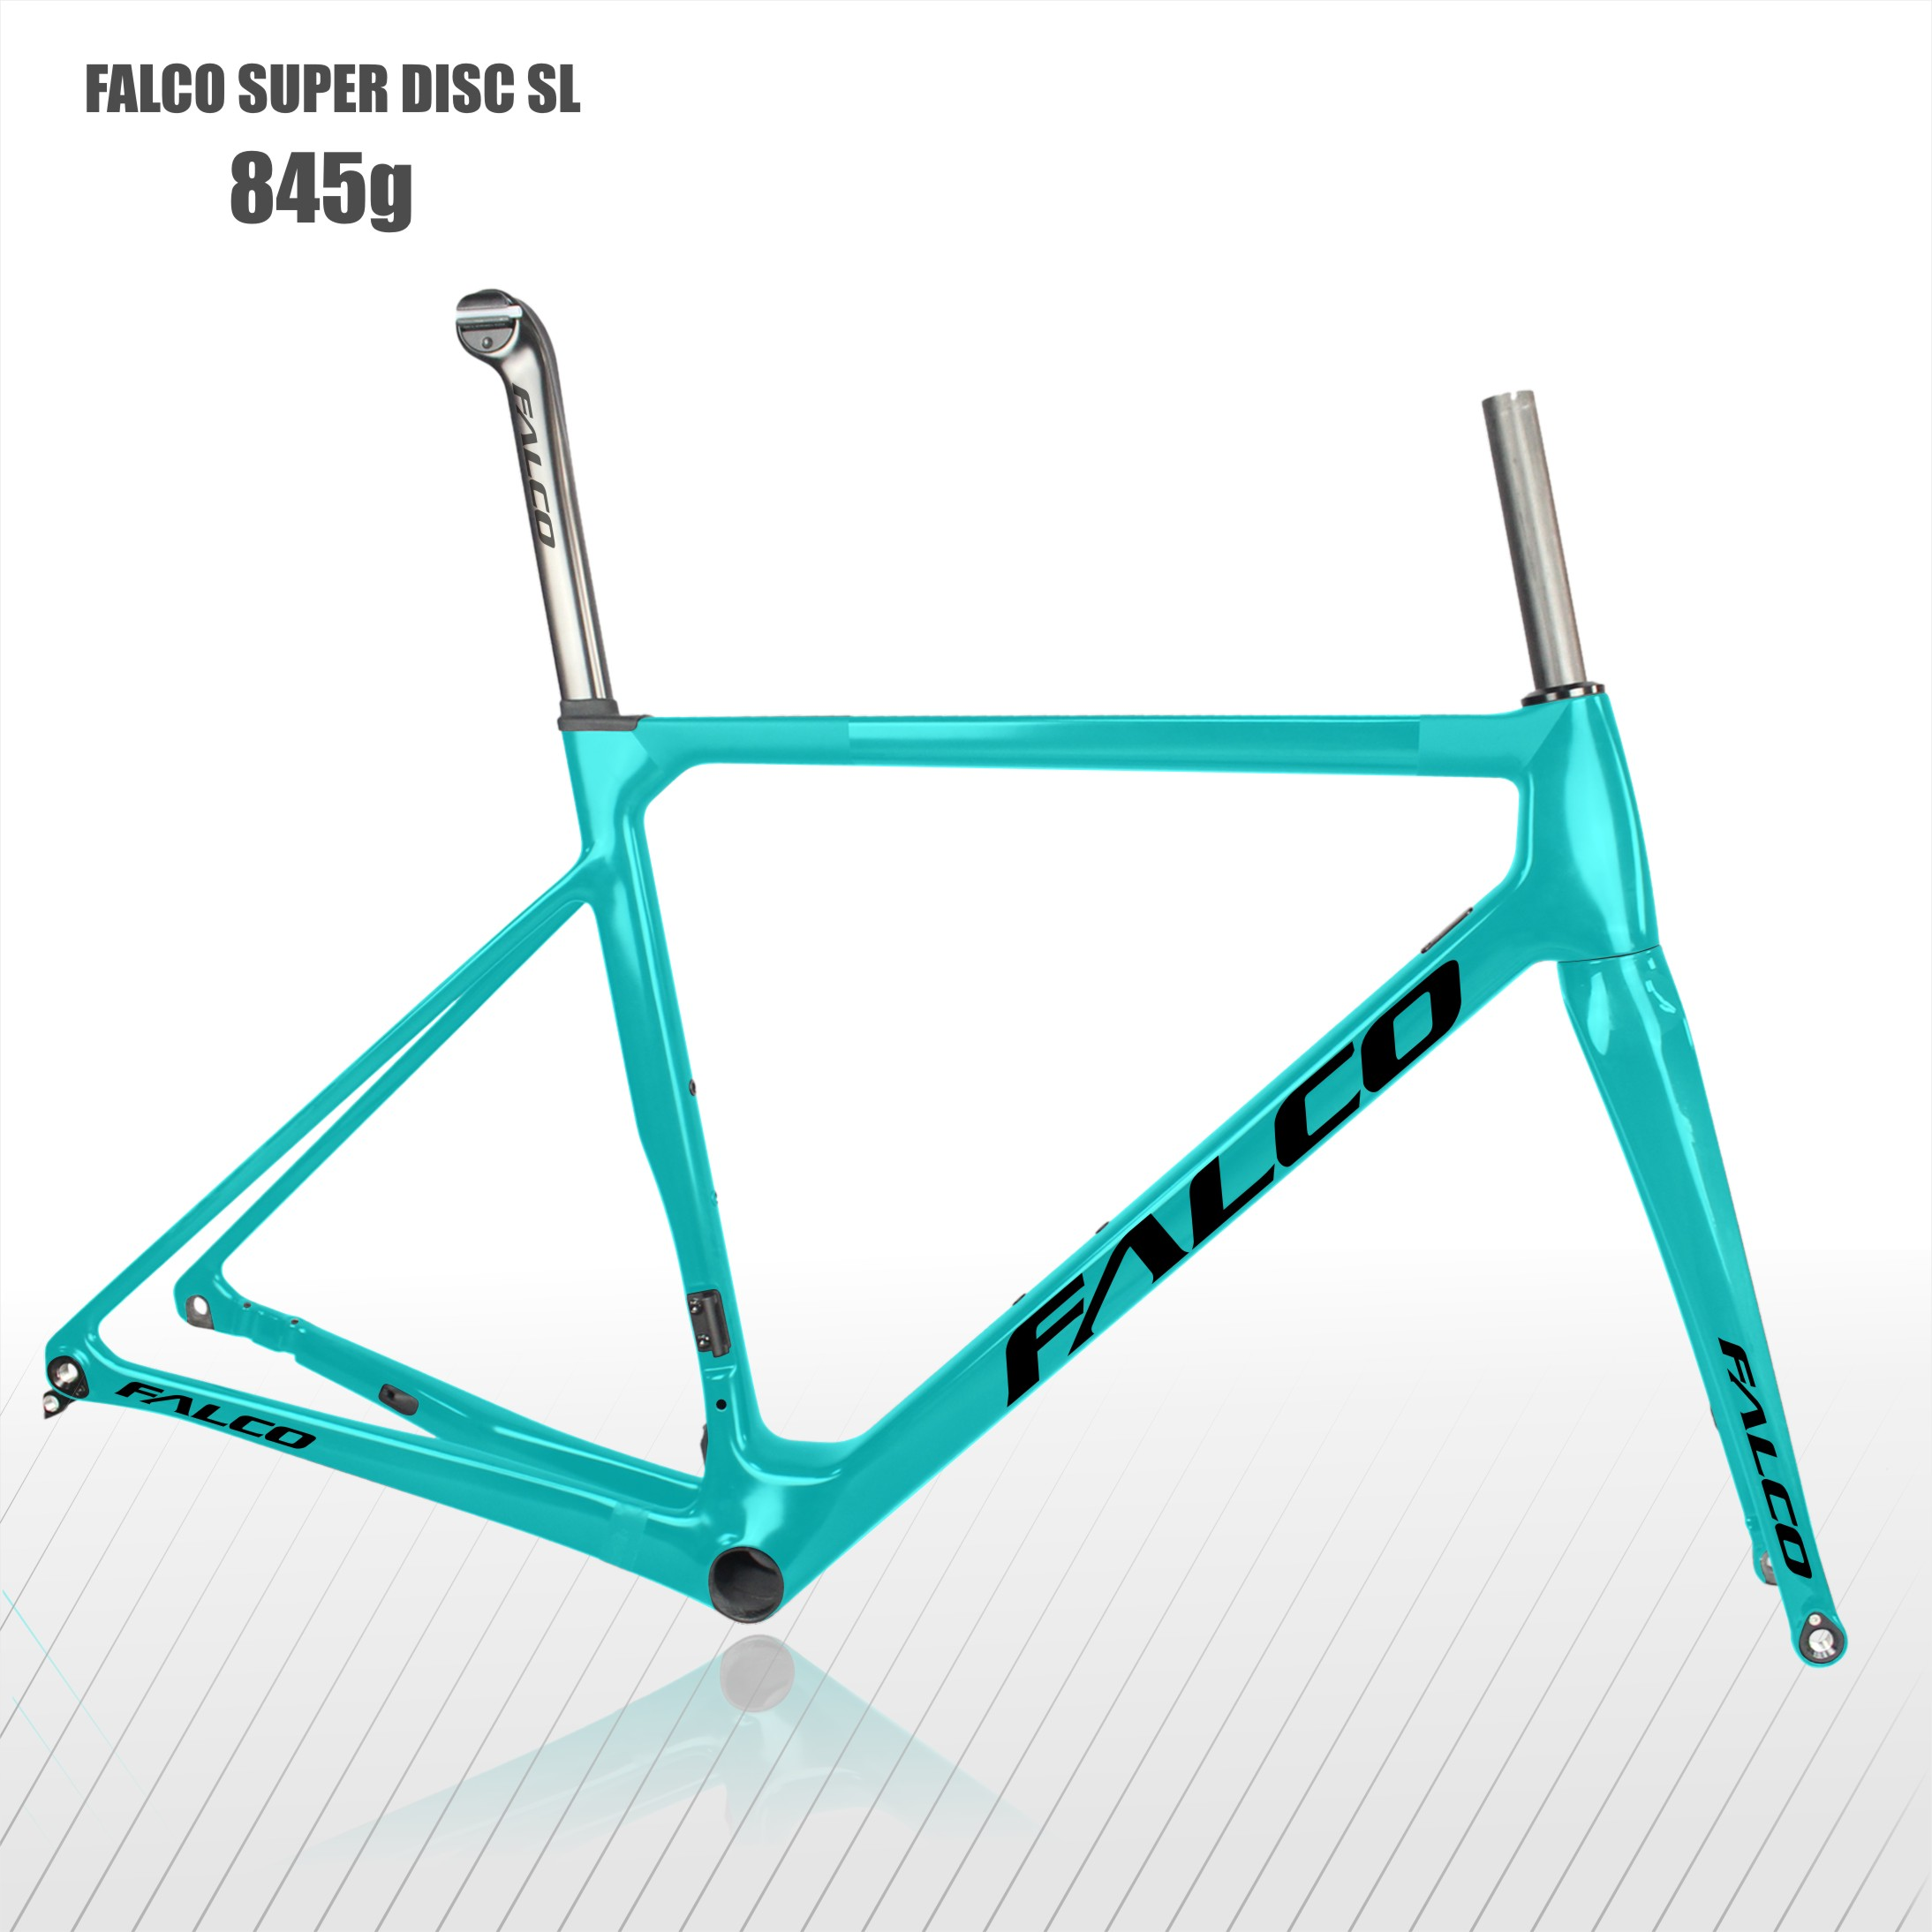 2020 FALCO Super disque vélos de route cadre en carbone T1000 Fiber de carbone 49 52 54 56 59 cm